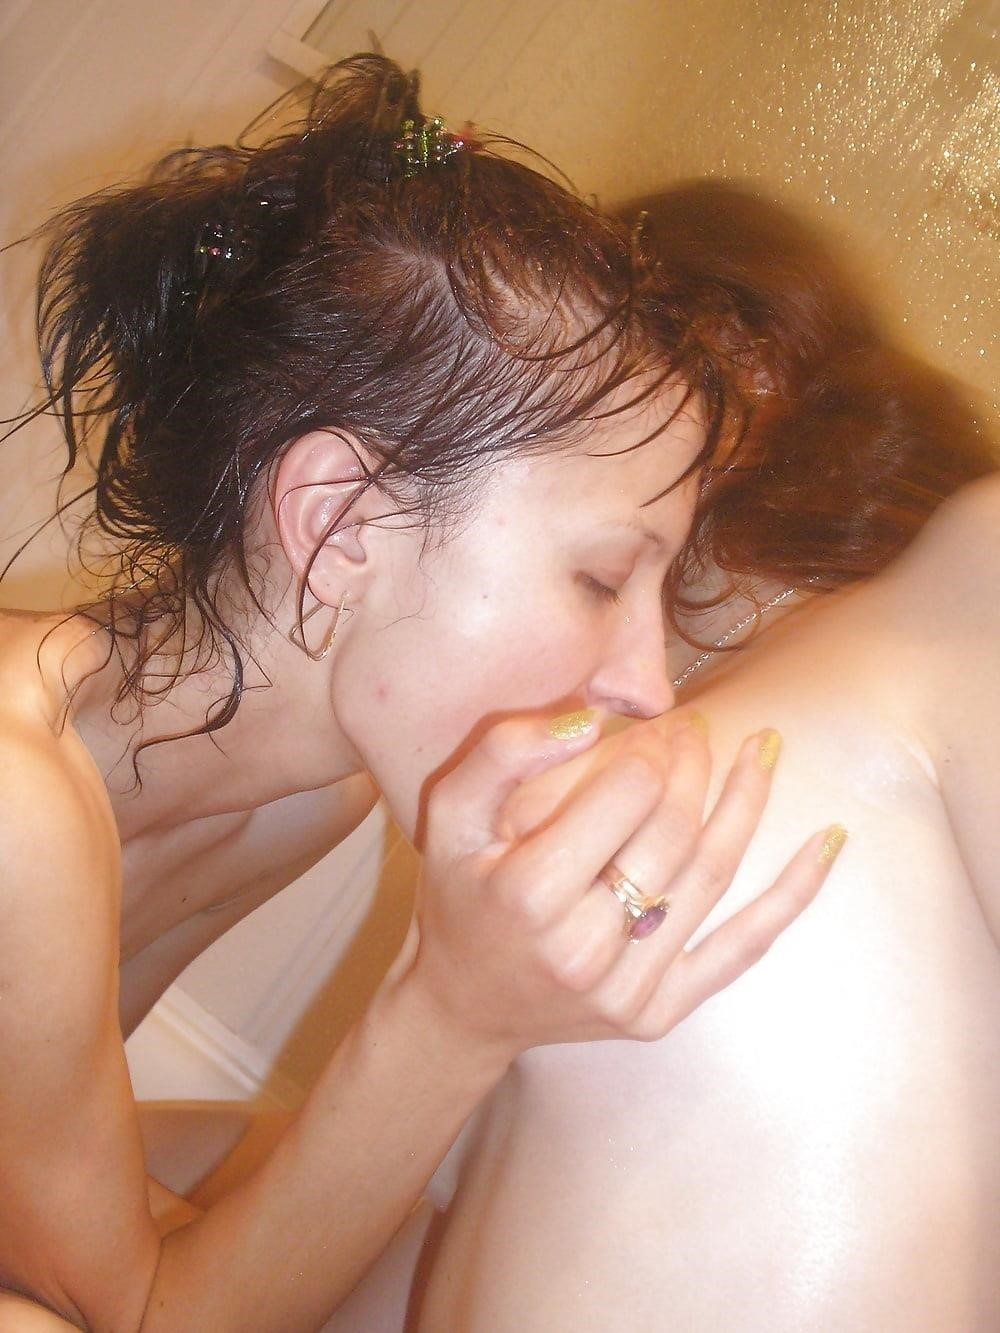 Hot lesbians make out naked-1333